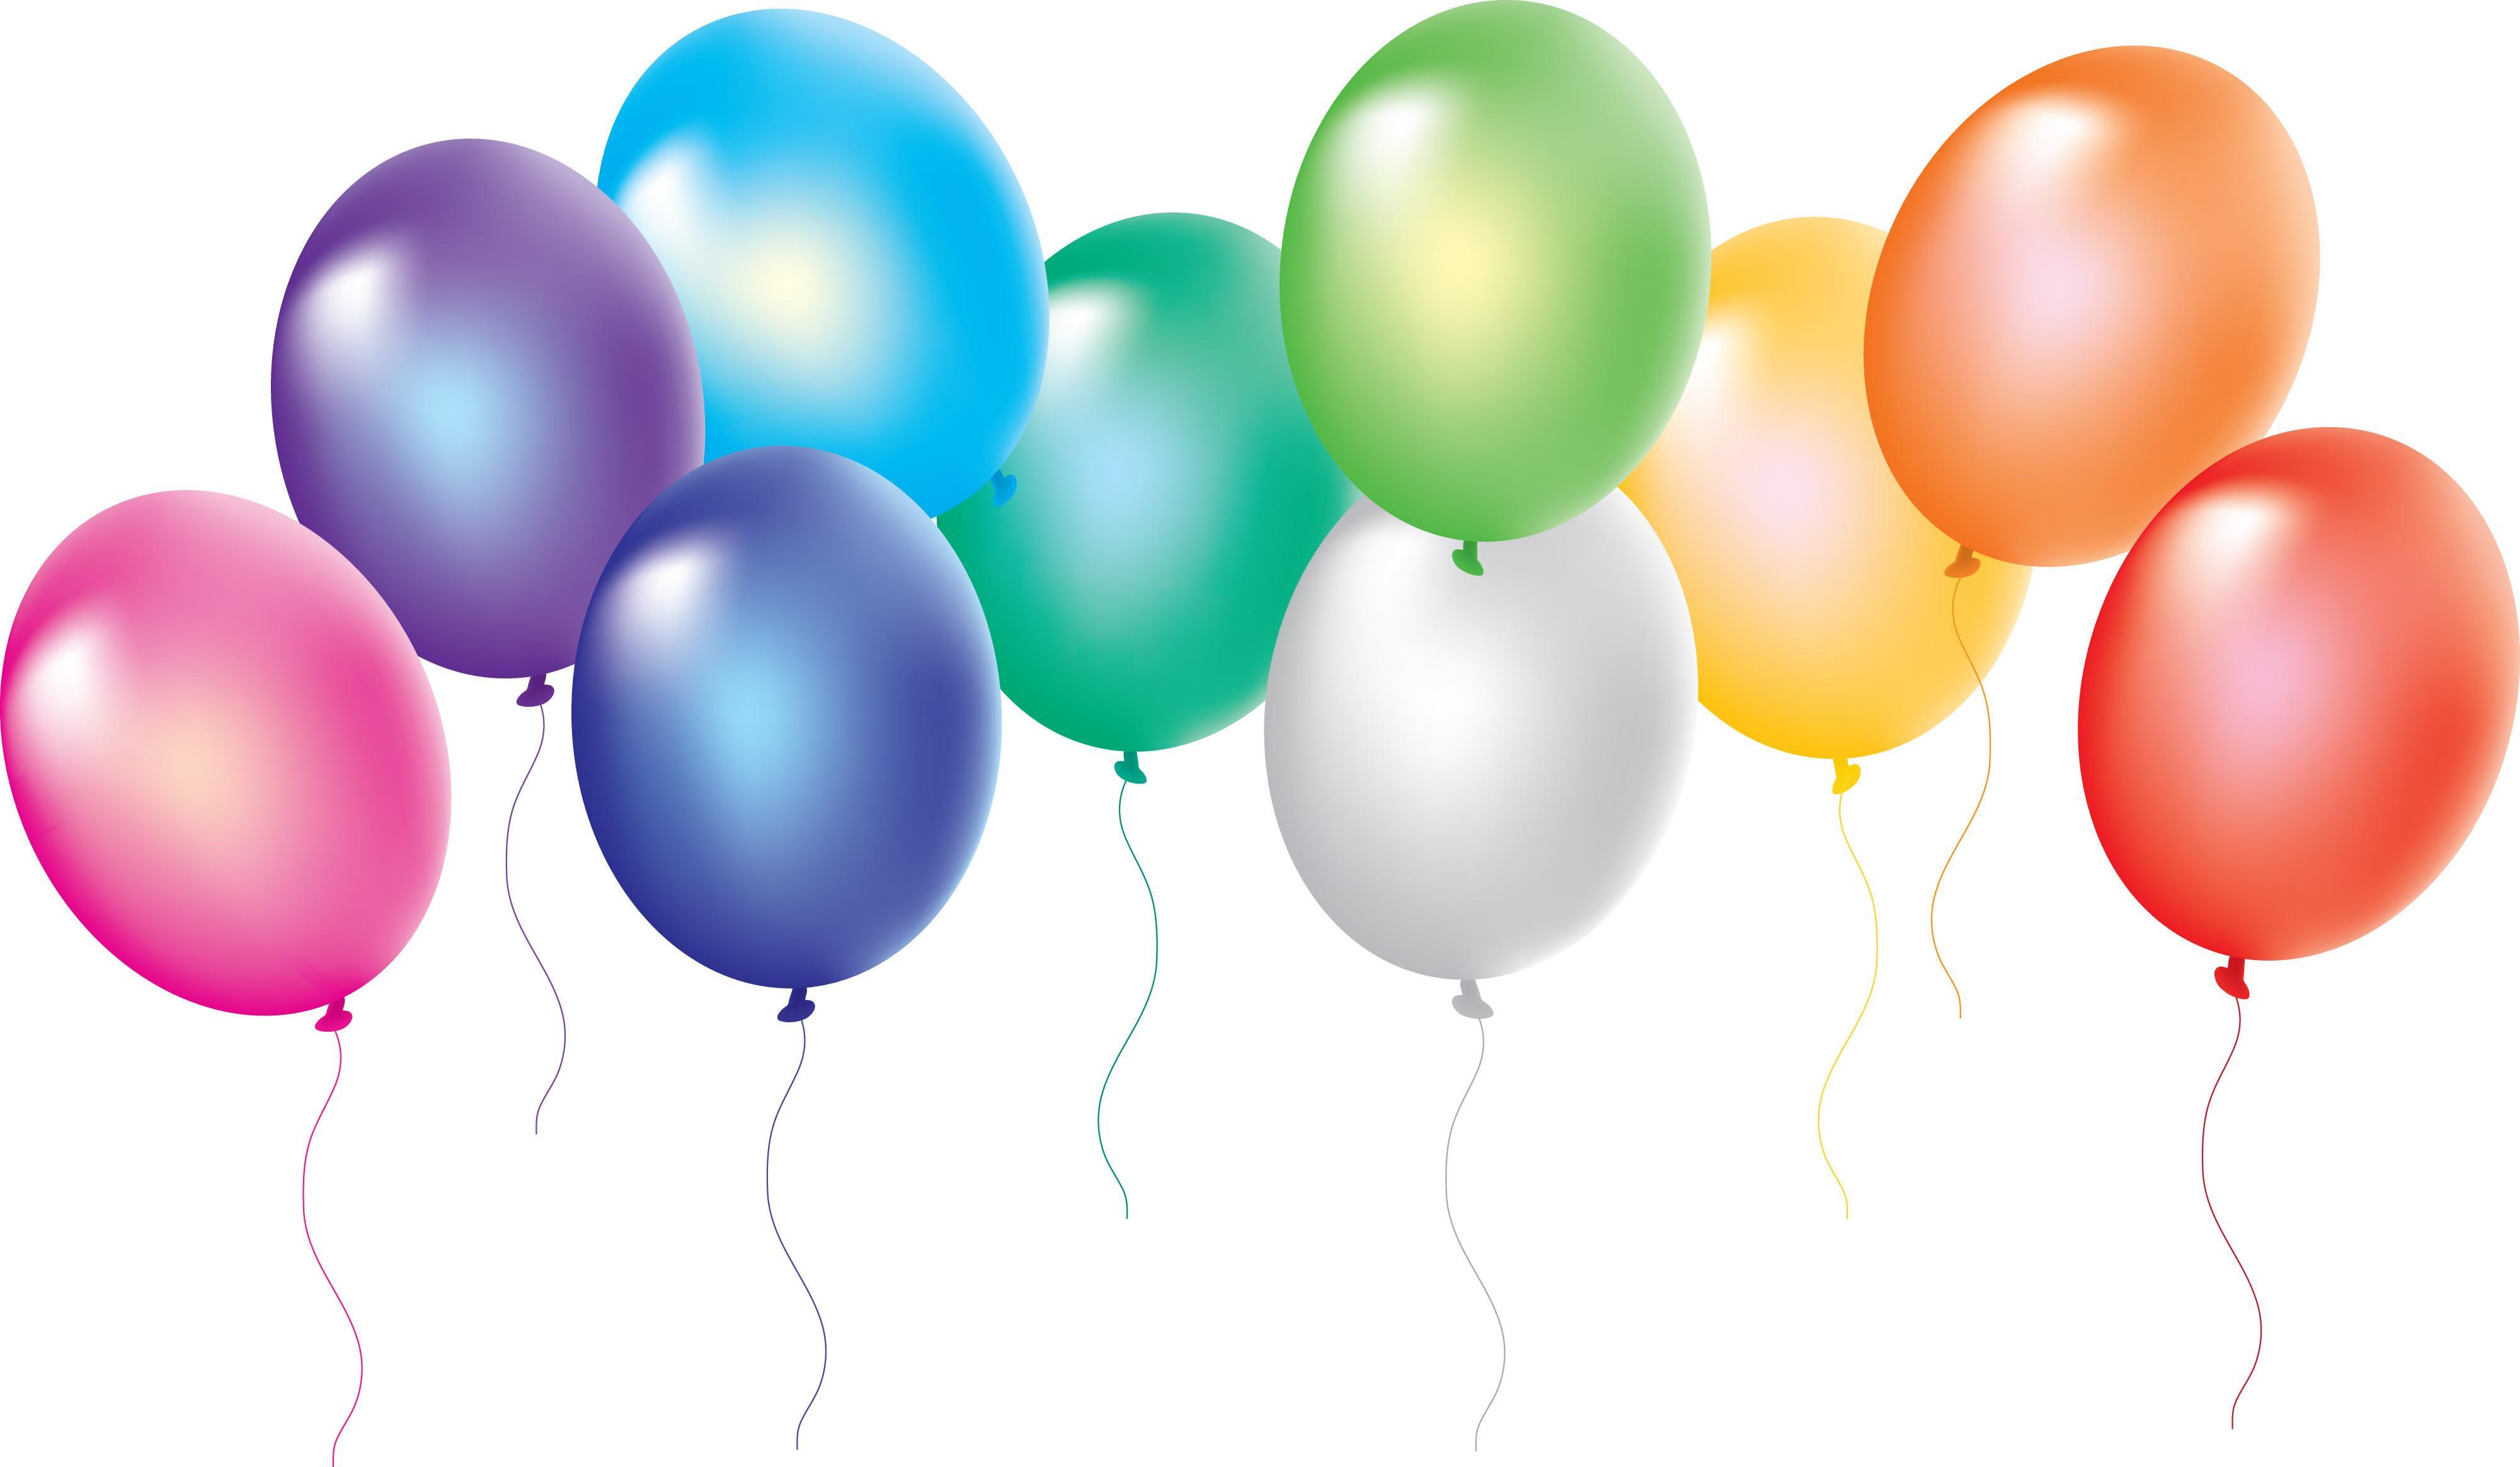 4000x2329 Top 10 Celebration Free Clip Art Happy Anniversary Clipartwiz Images